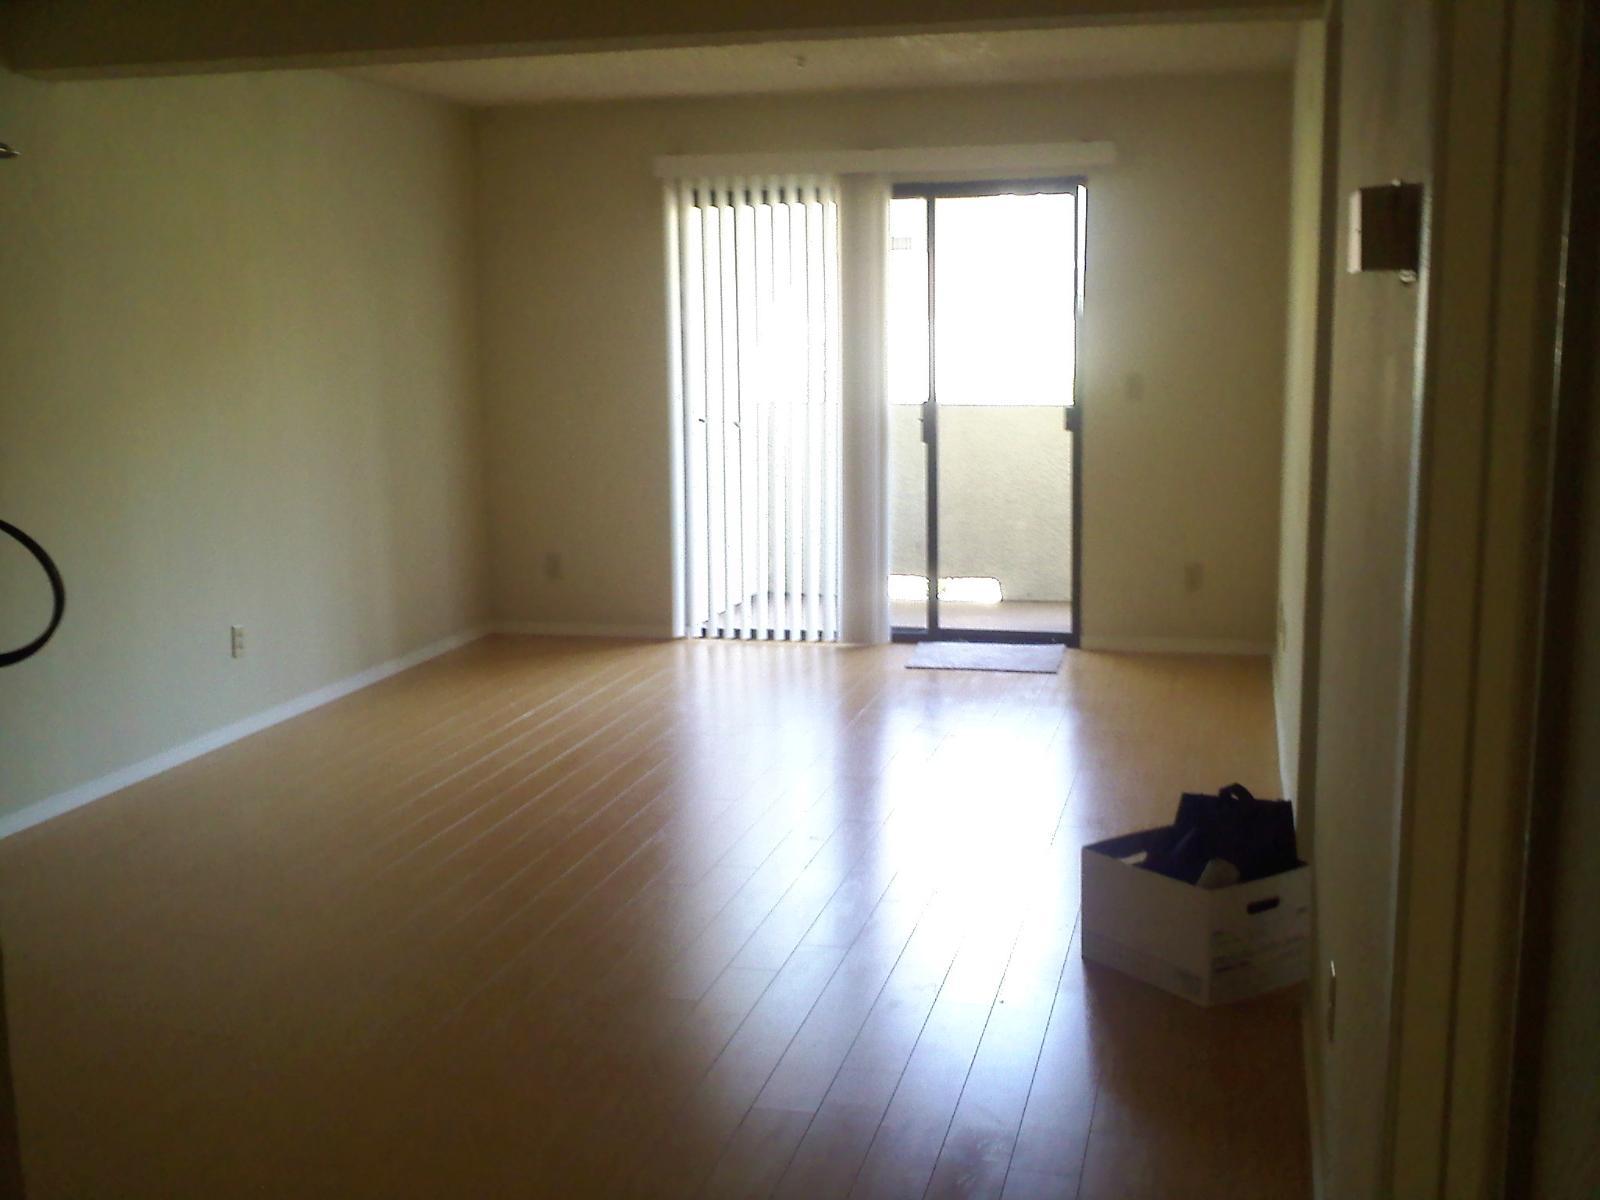 [livingroom]